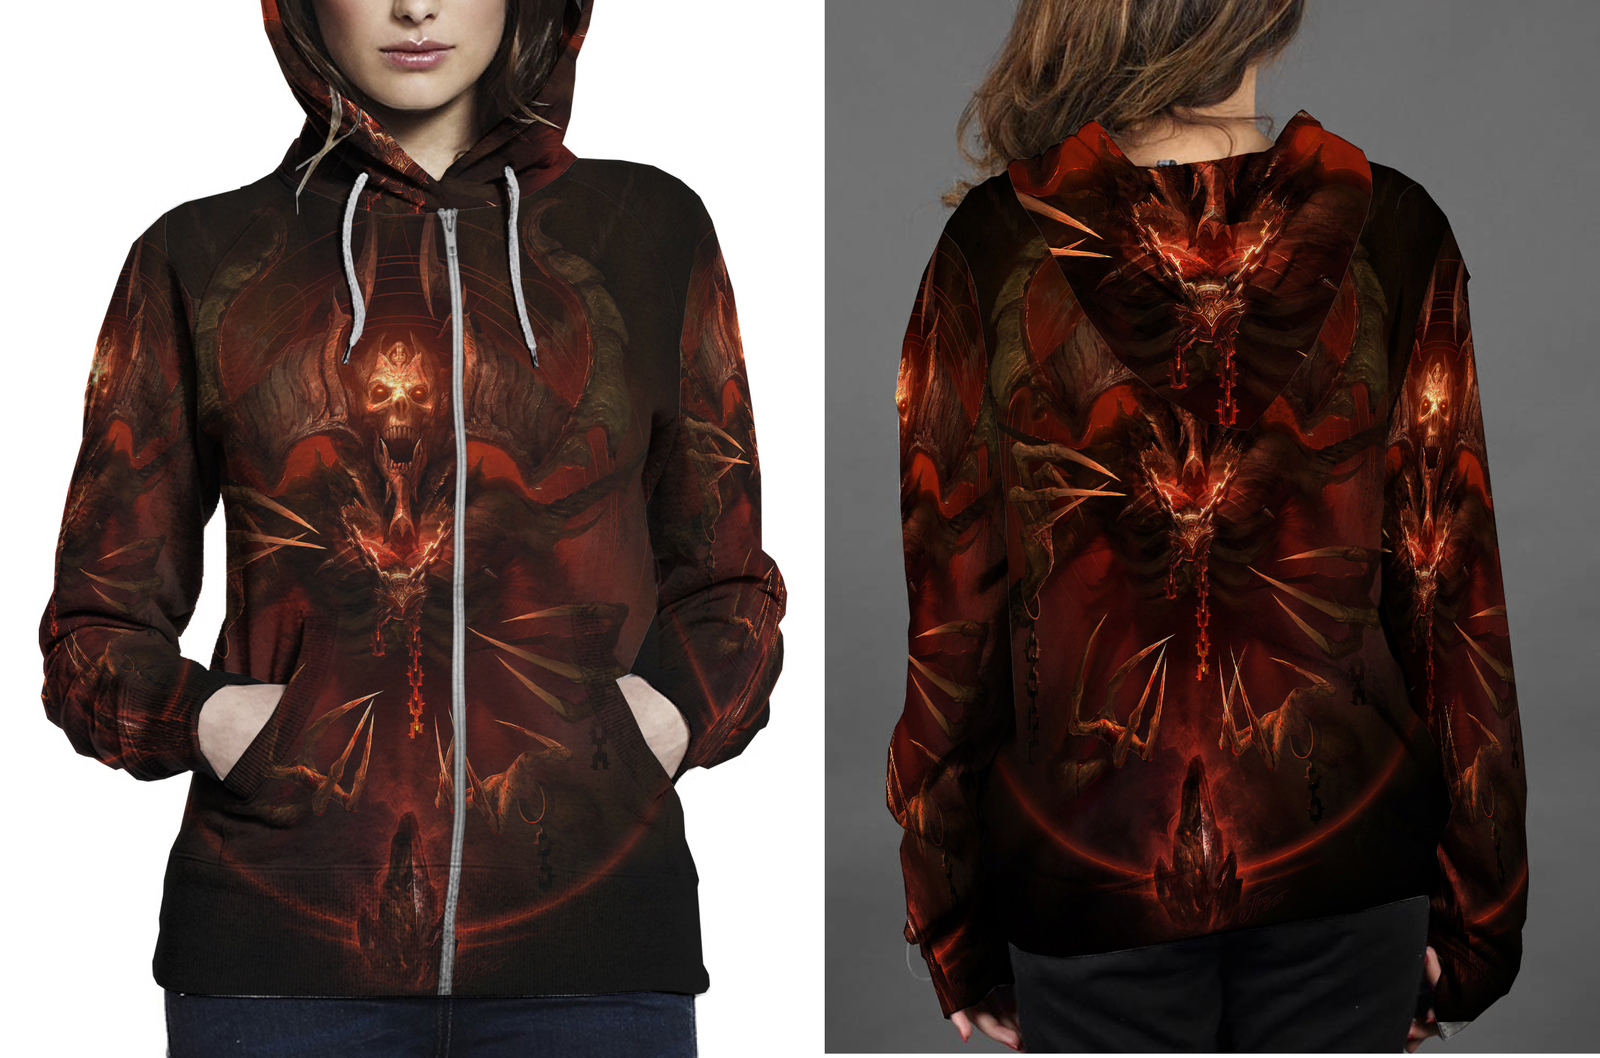 Mephisto  lord of hatred zipper hoodie women s